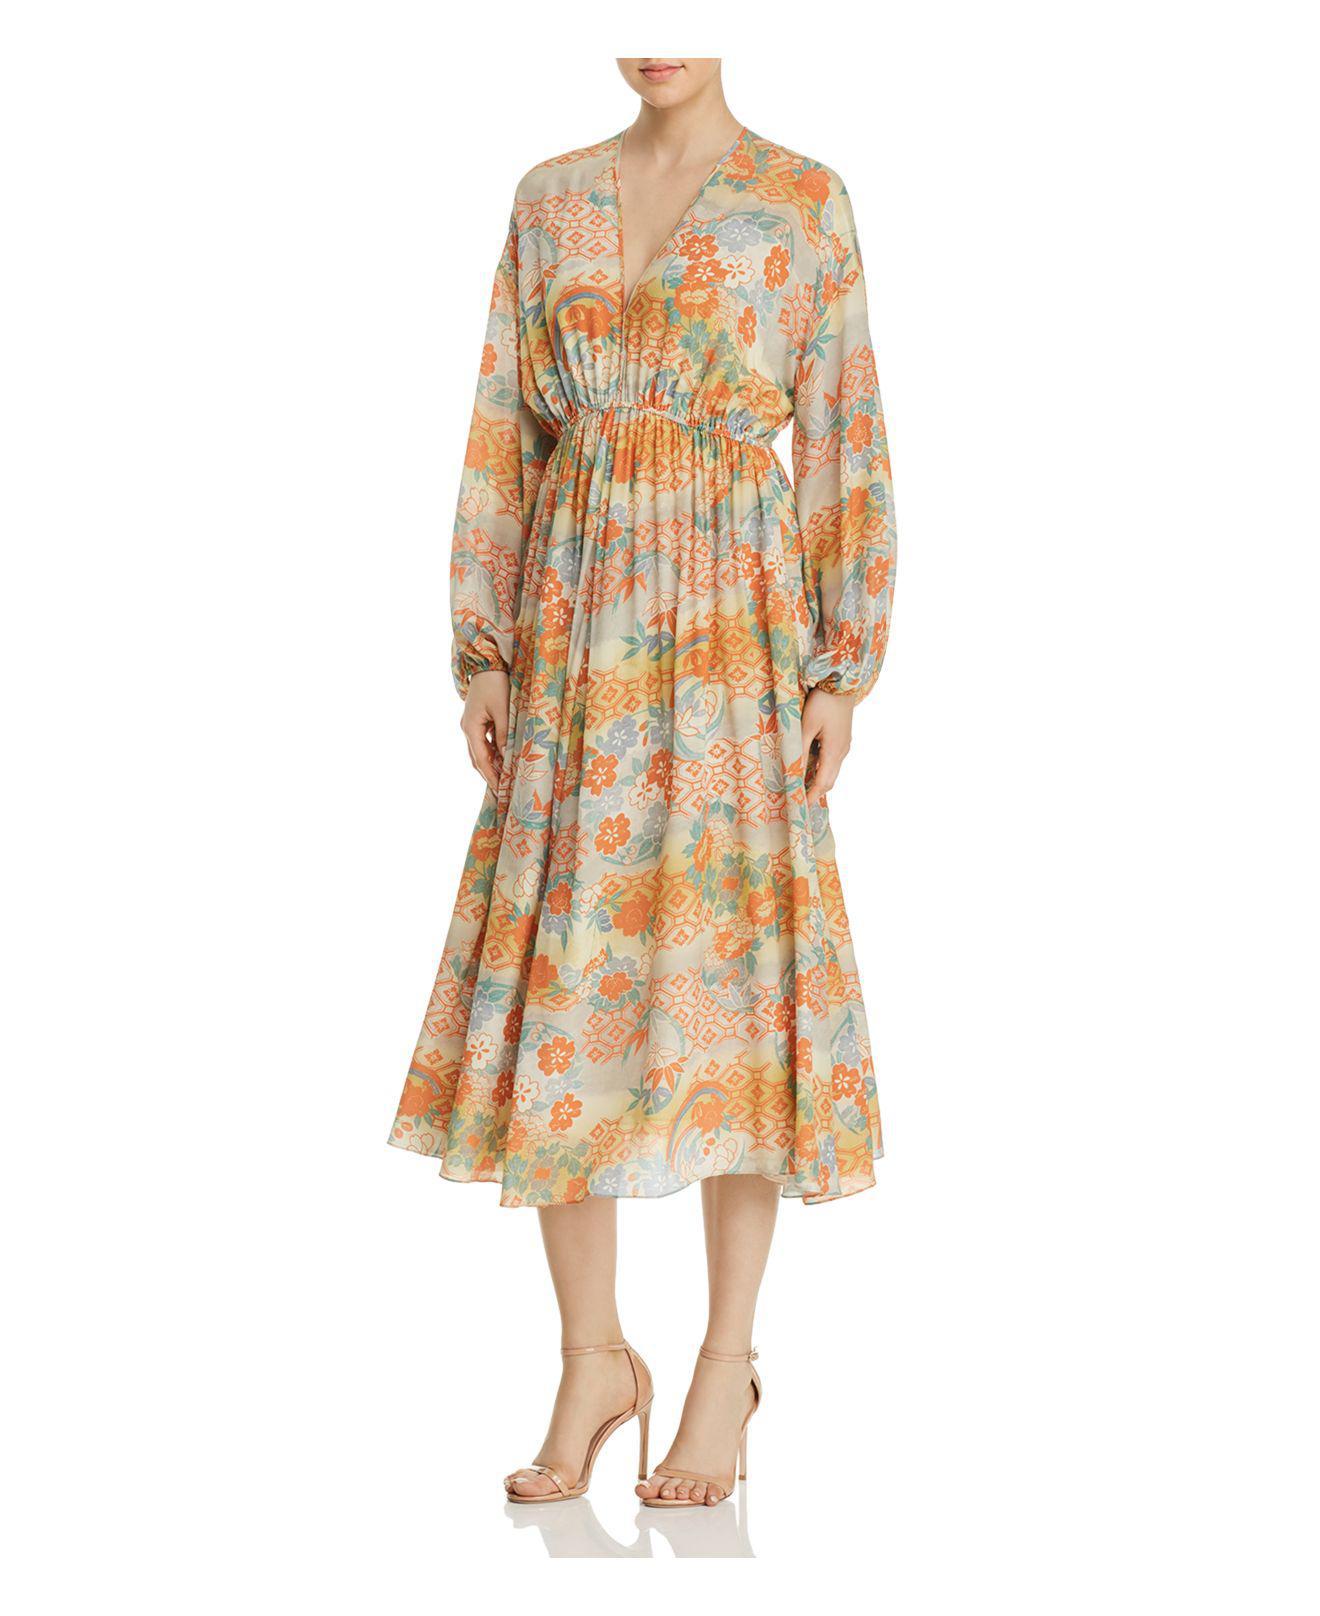 Norma Printed Silk Maxi Dress - Marigold Elizabeth & James kUayGC